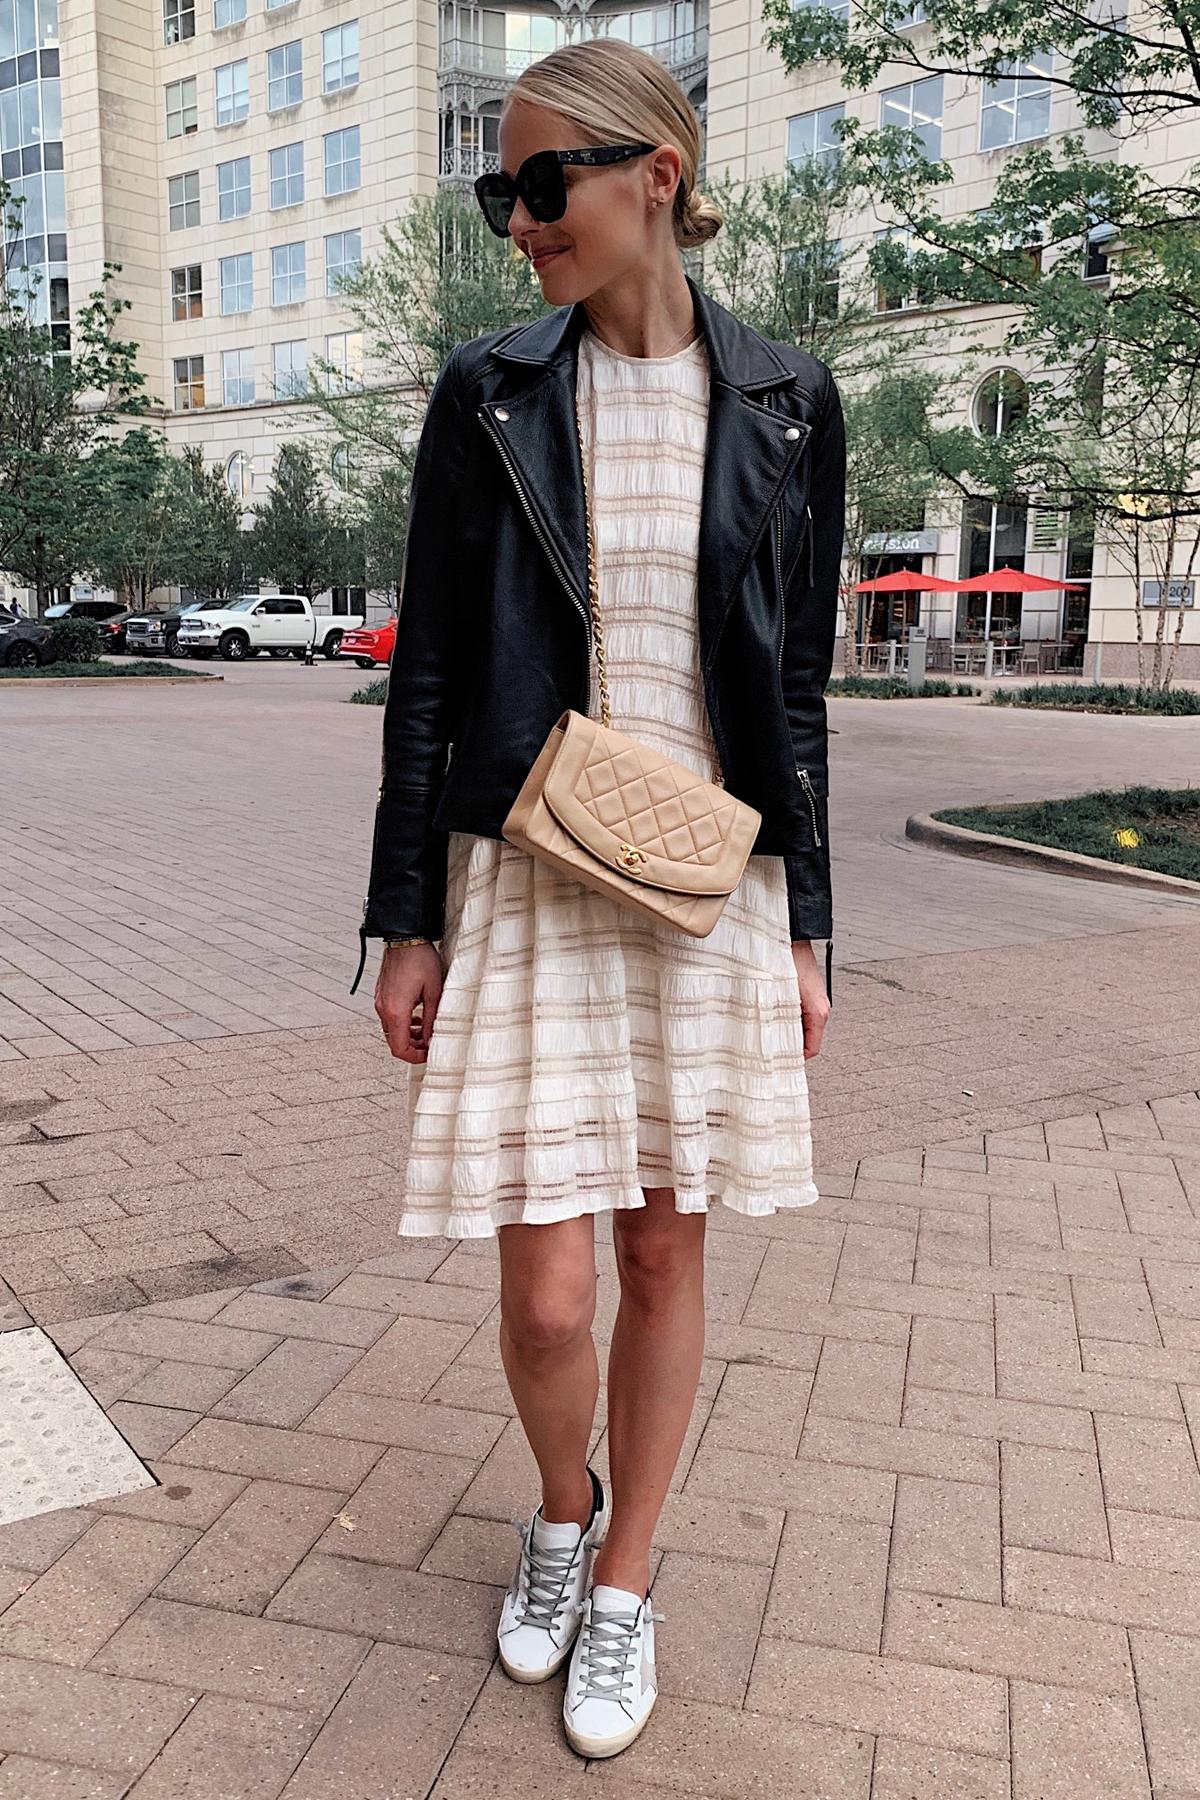 Fashion Jackson Wearing Black Leather Jacket Anine Bing White Dress Chanel Handbag Golden Goose Sneakers